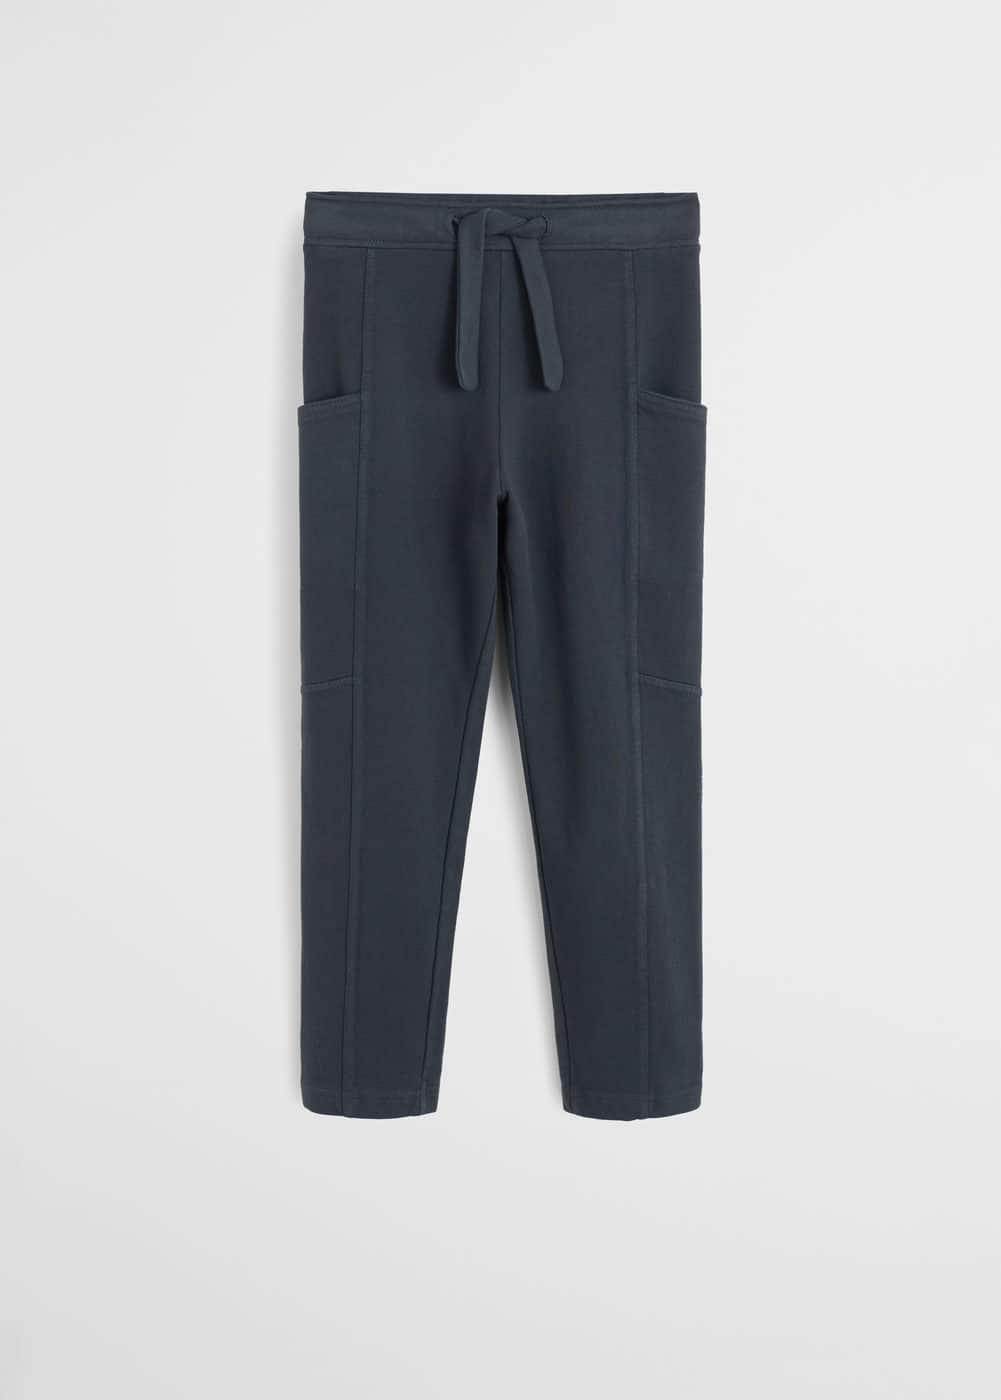 a-barna:pantalon algodon bolsillos